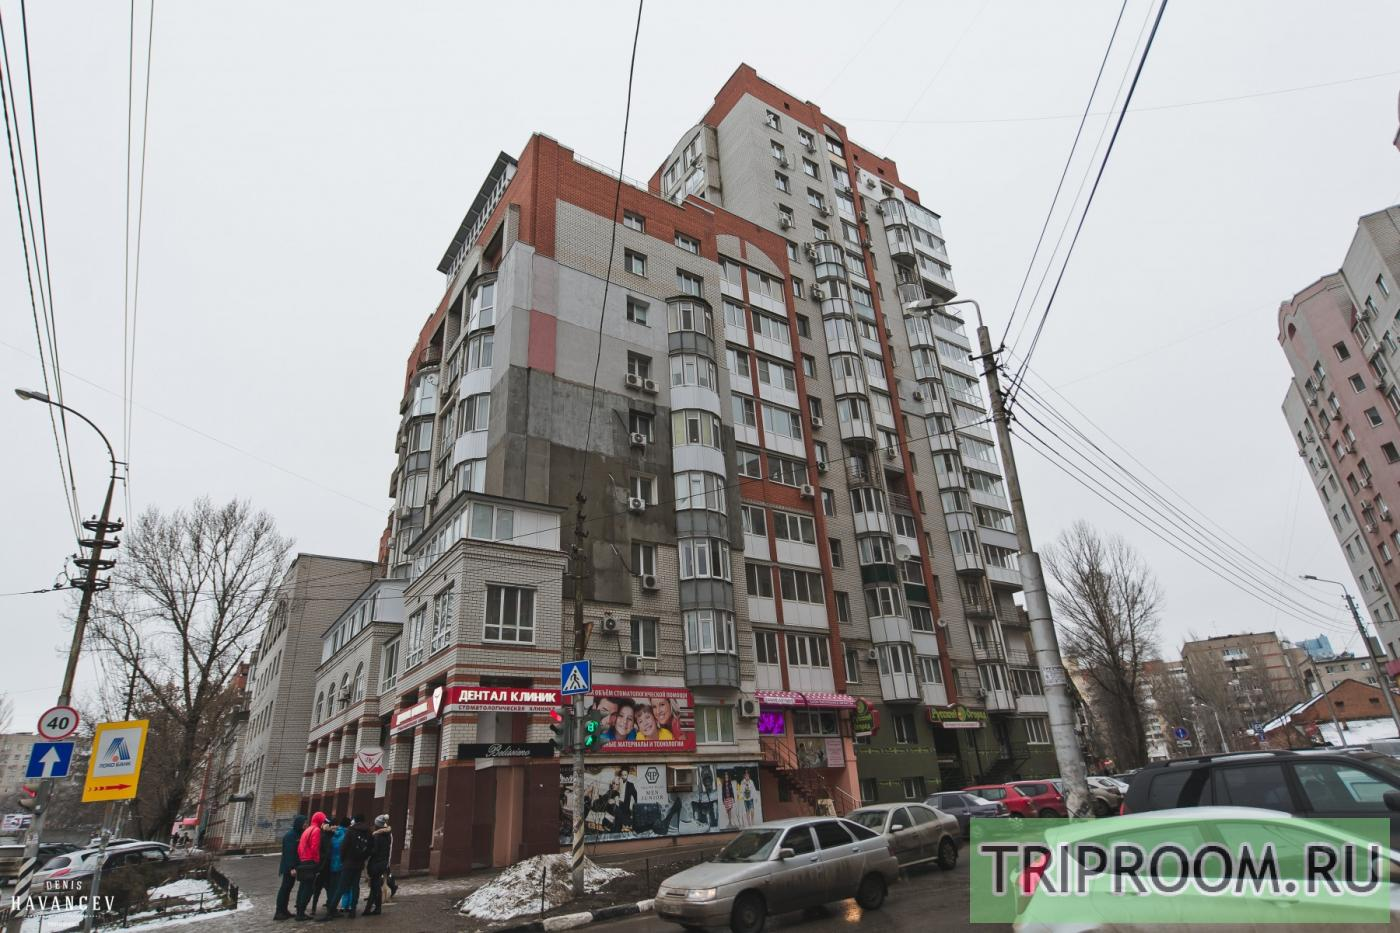 1-комнатная квартира посуточно (вариант № 14832), ул. Пугачева улица, фото № 15